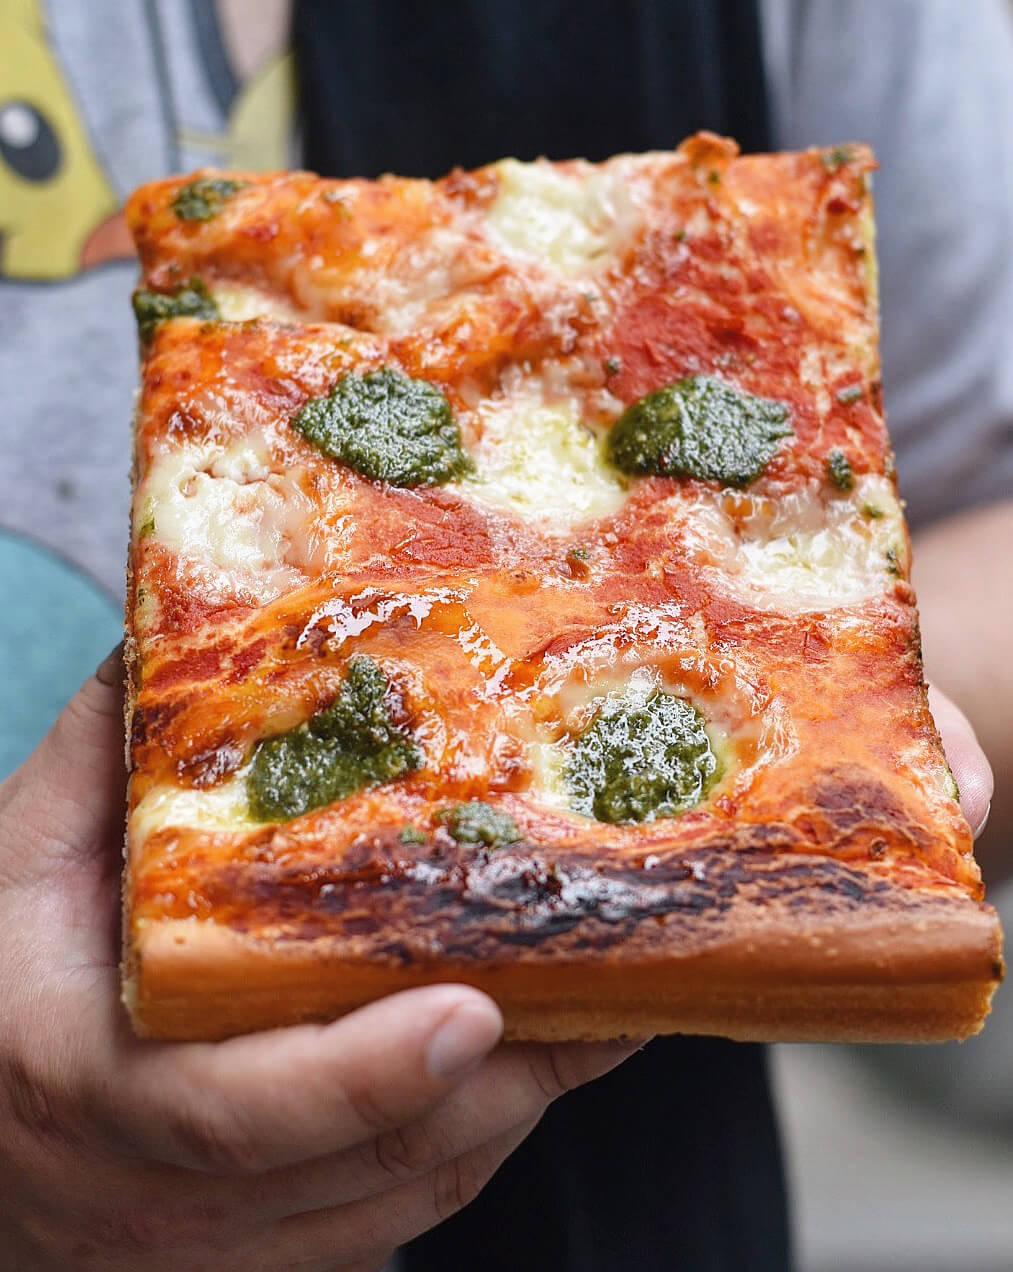 Cinque Terre Italy Five Villages Travel Food Liquria Region Focaccia Bread Pizza Pesto